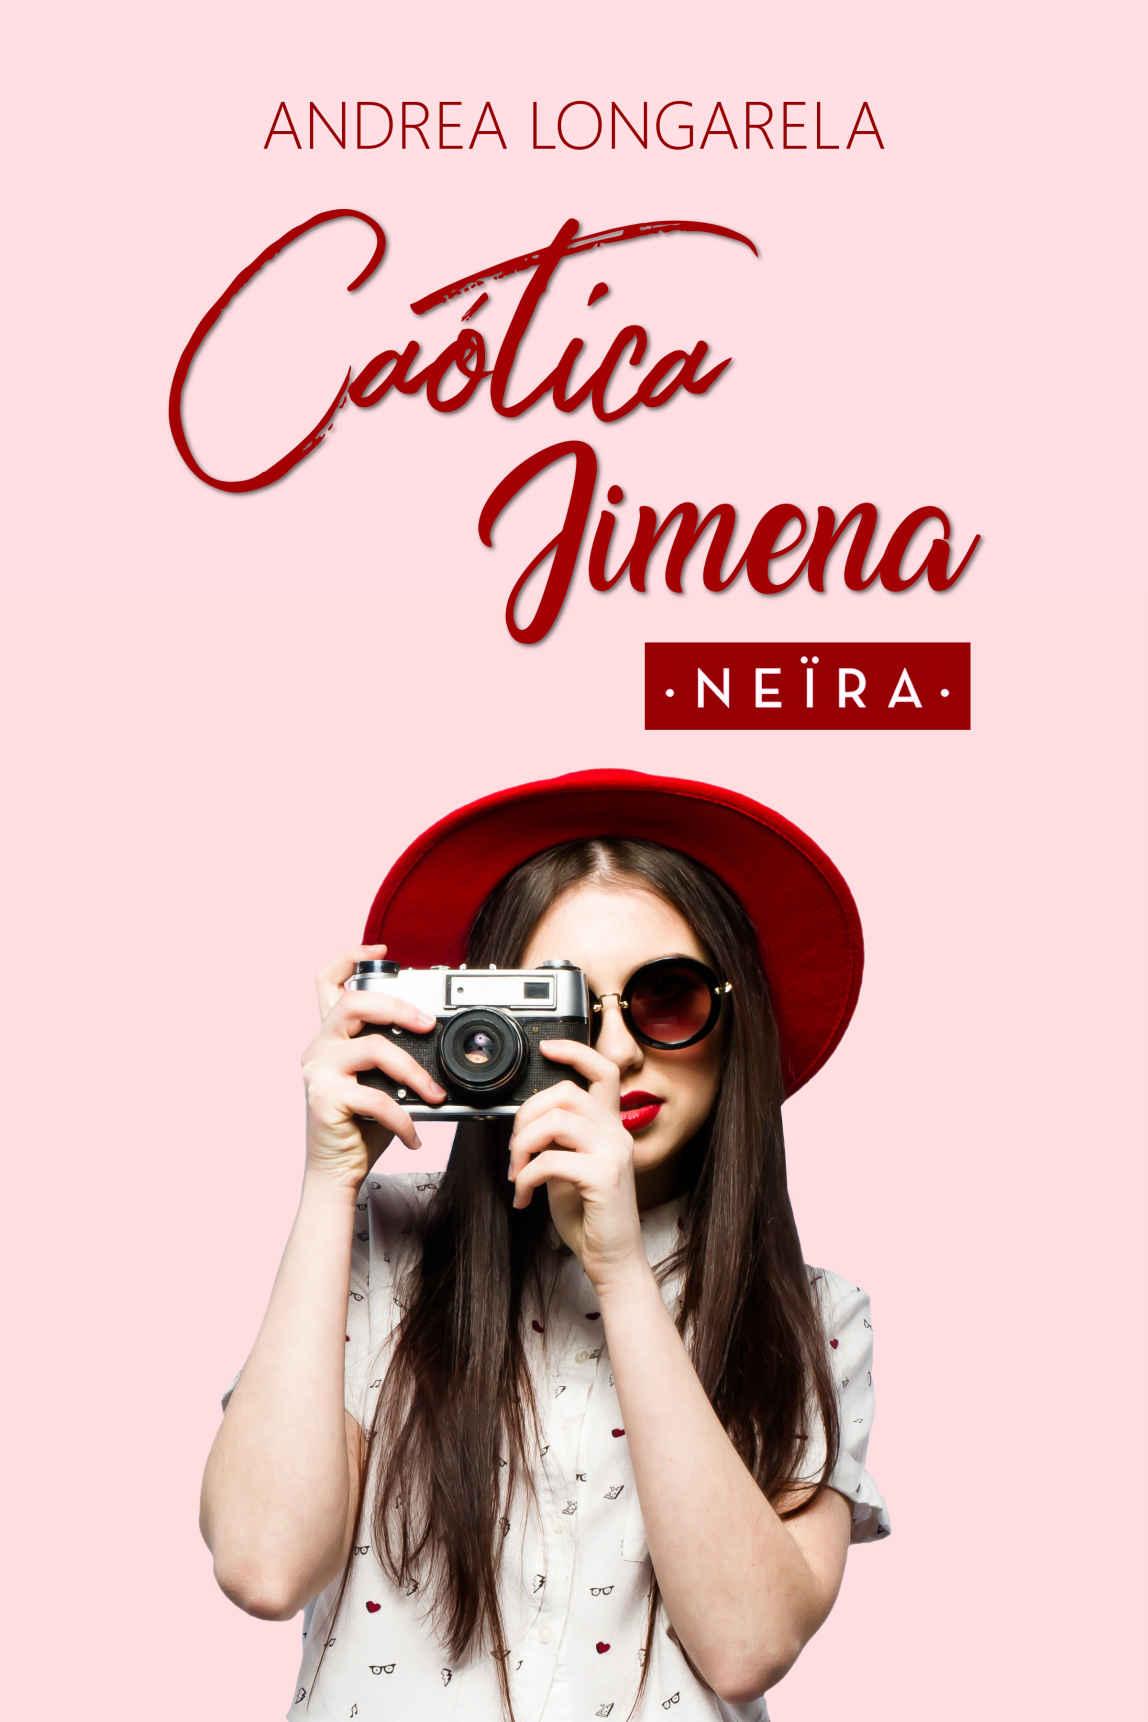 Caótica Jimena - Andrea Longarela (Neïra)